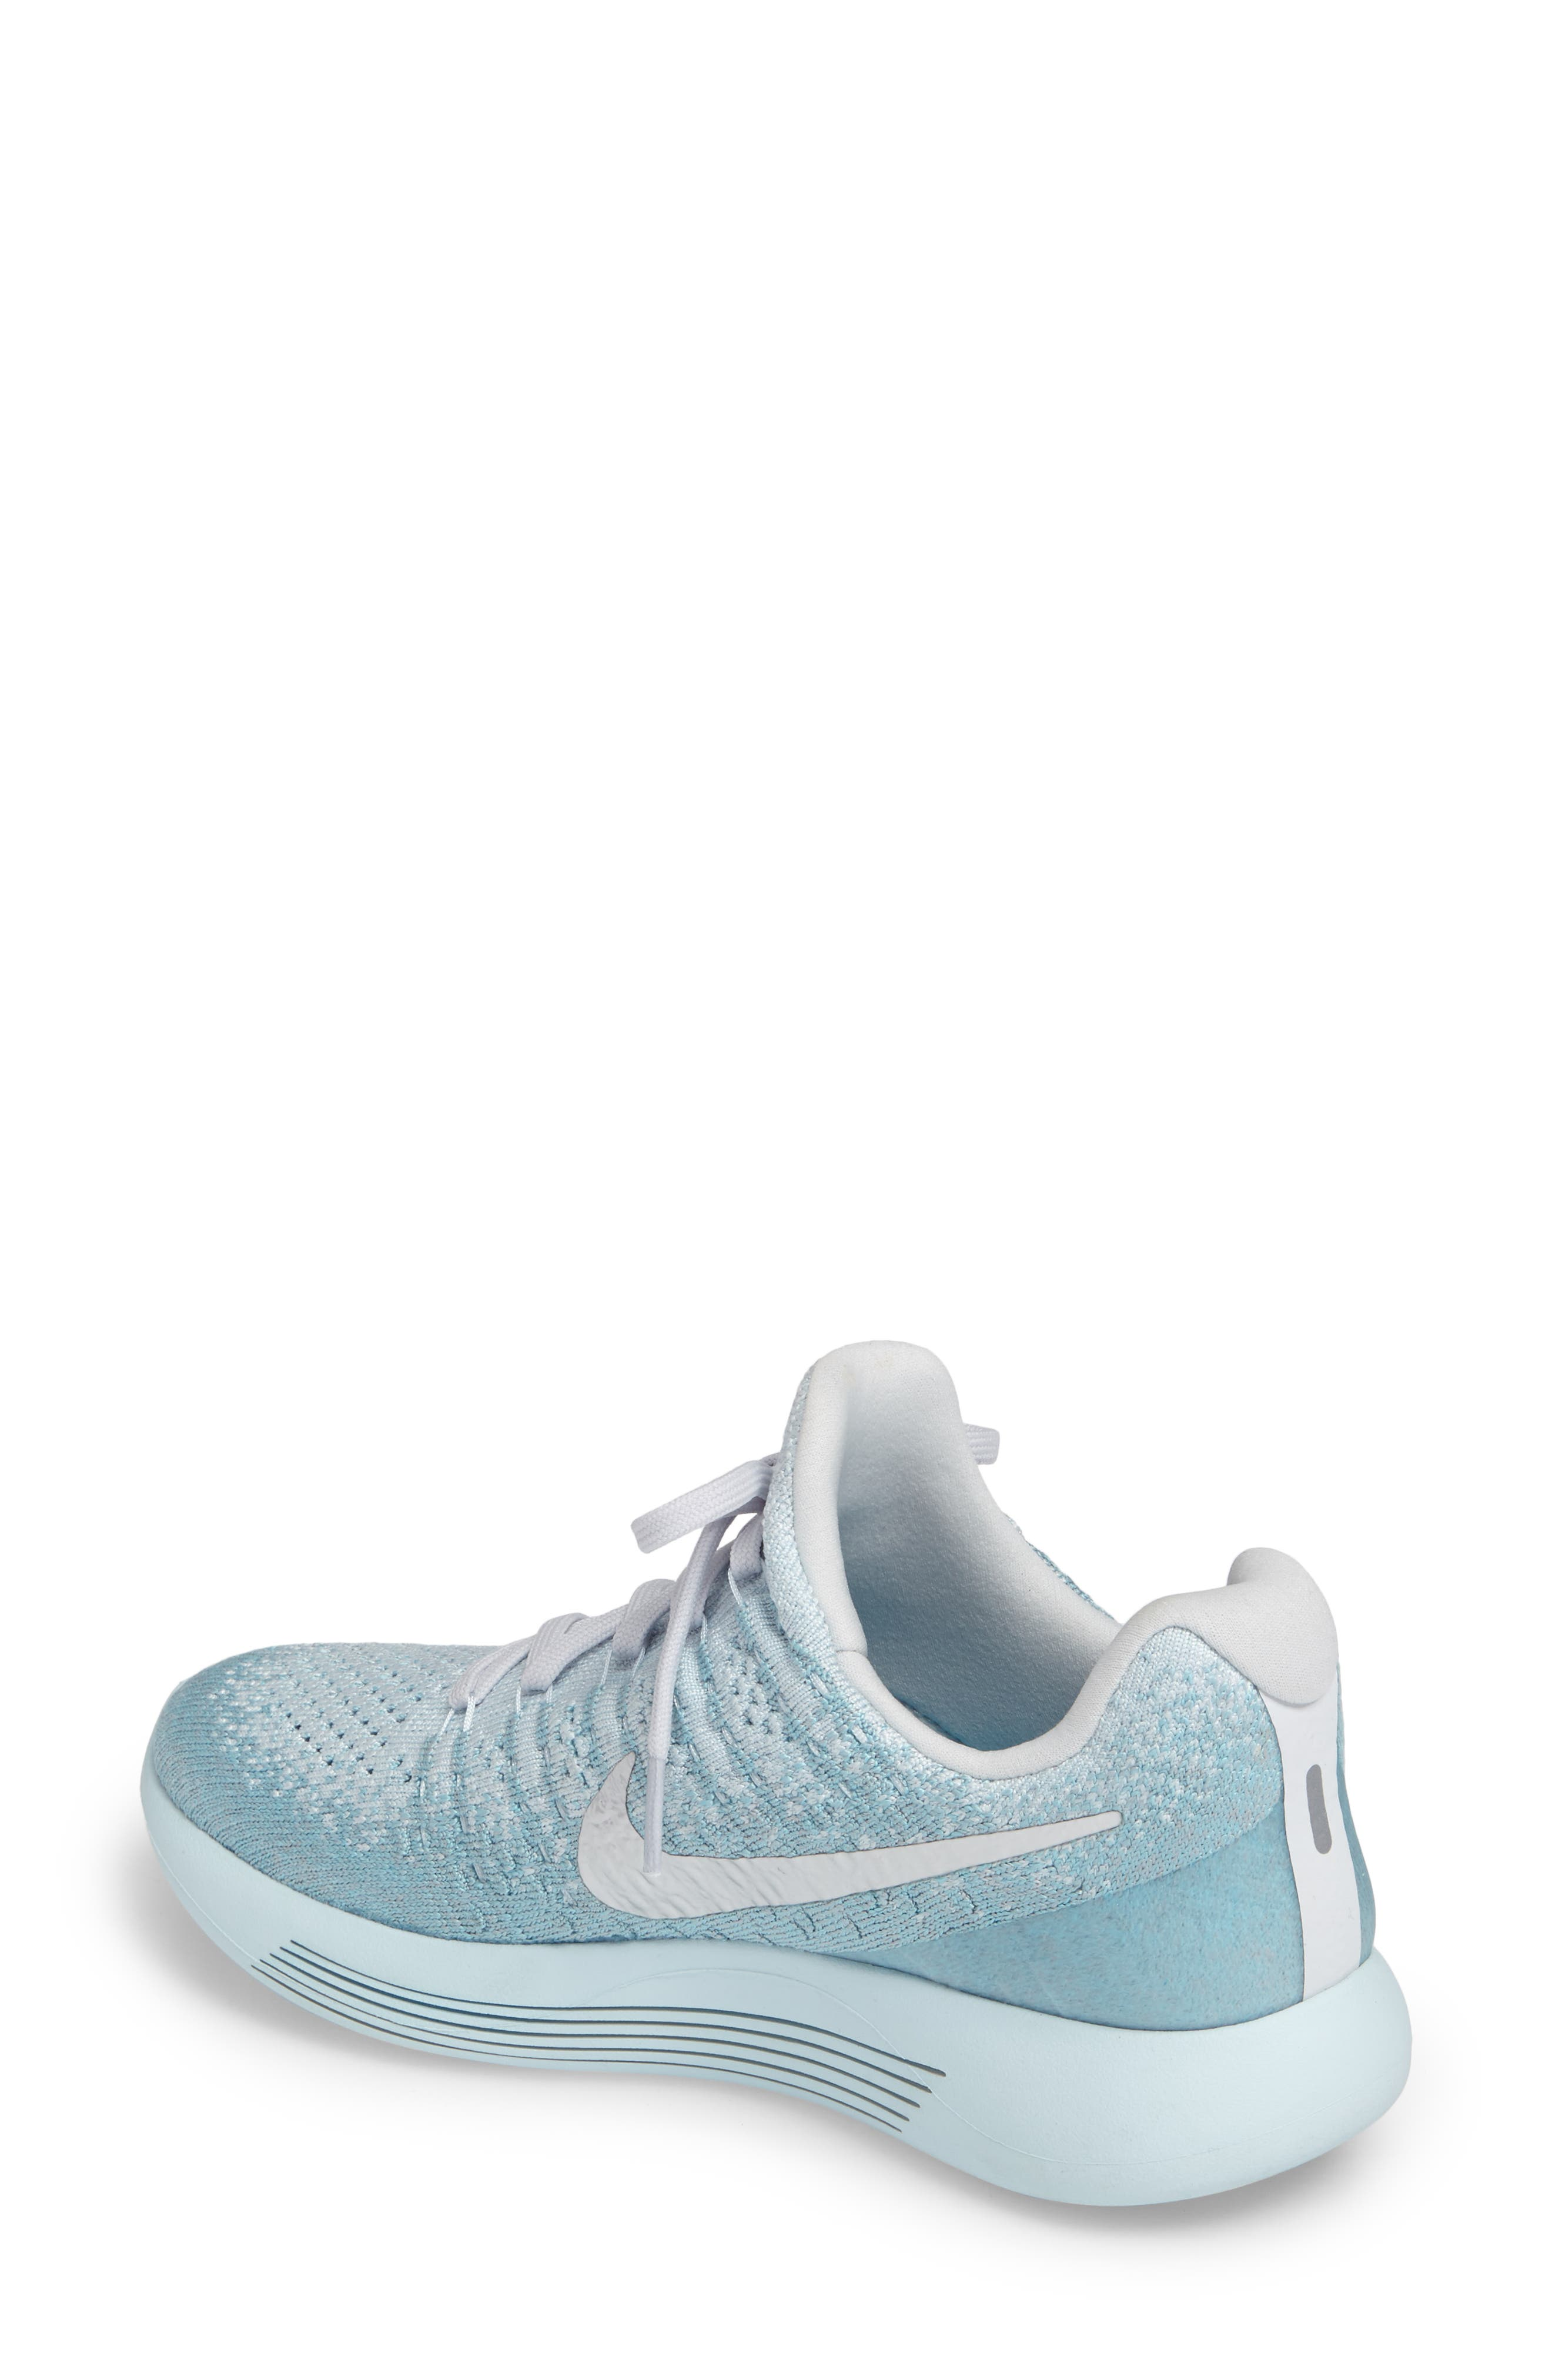 LunarEpic Low Flyknit 2 Running Shoe,                             Alternate thumbnail 34, color,